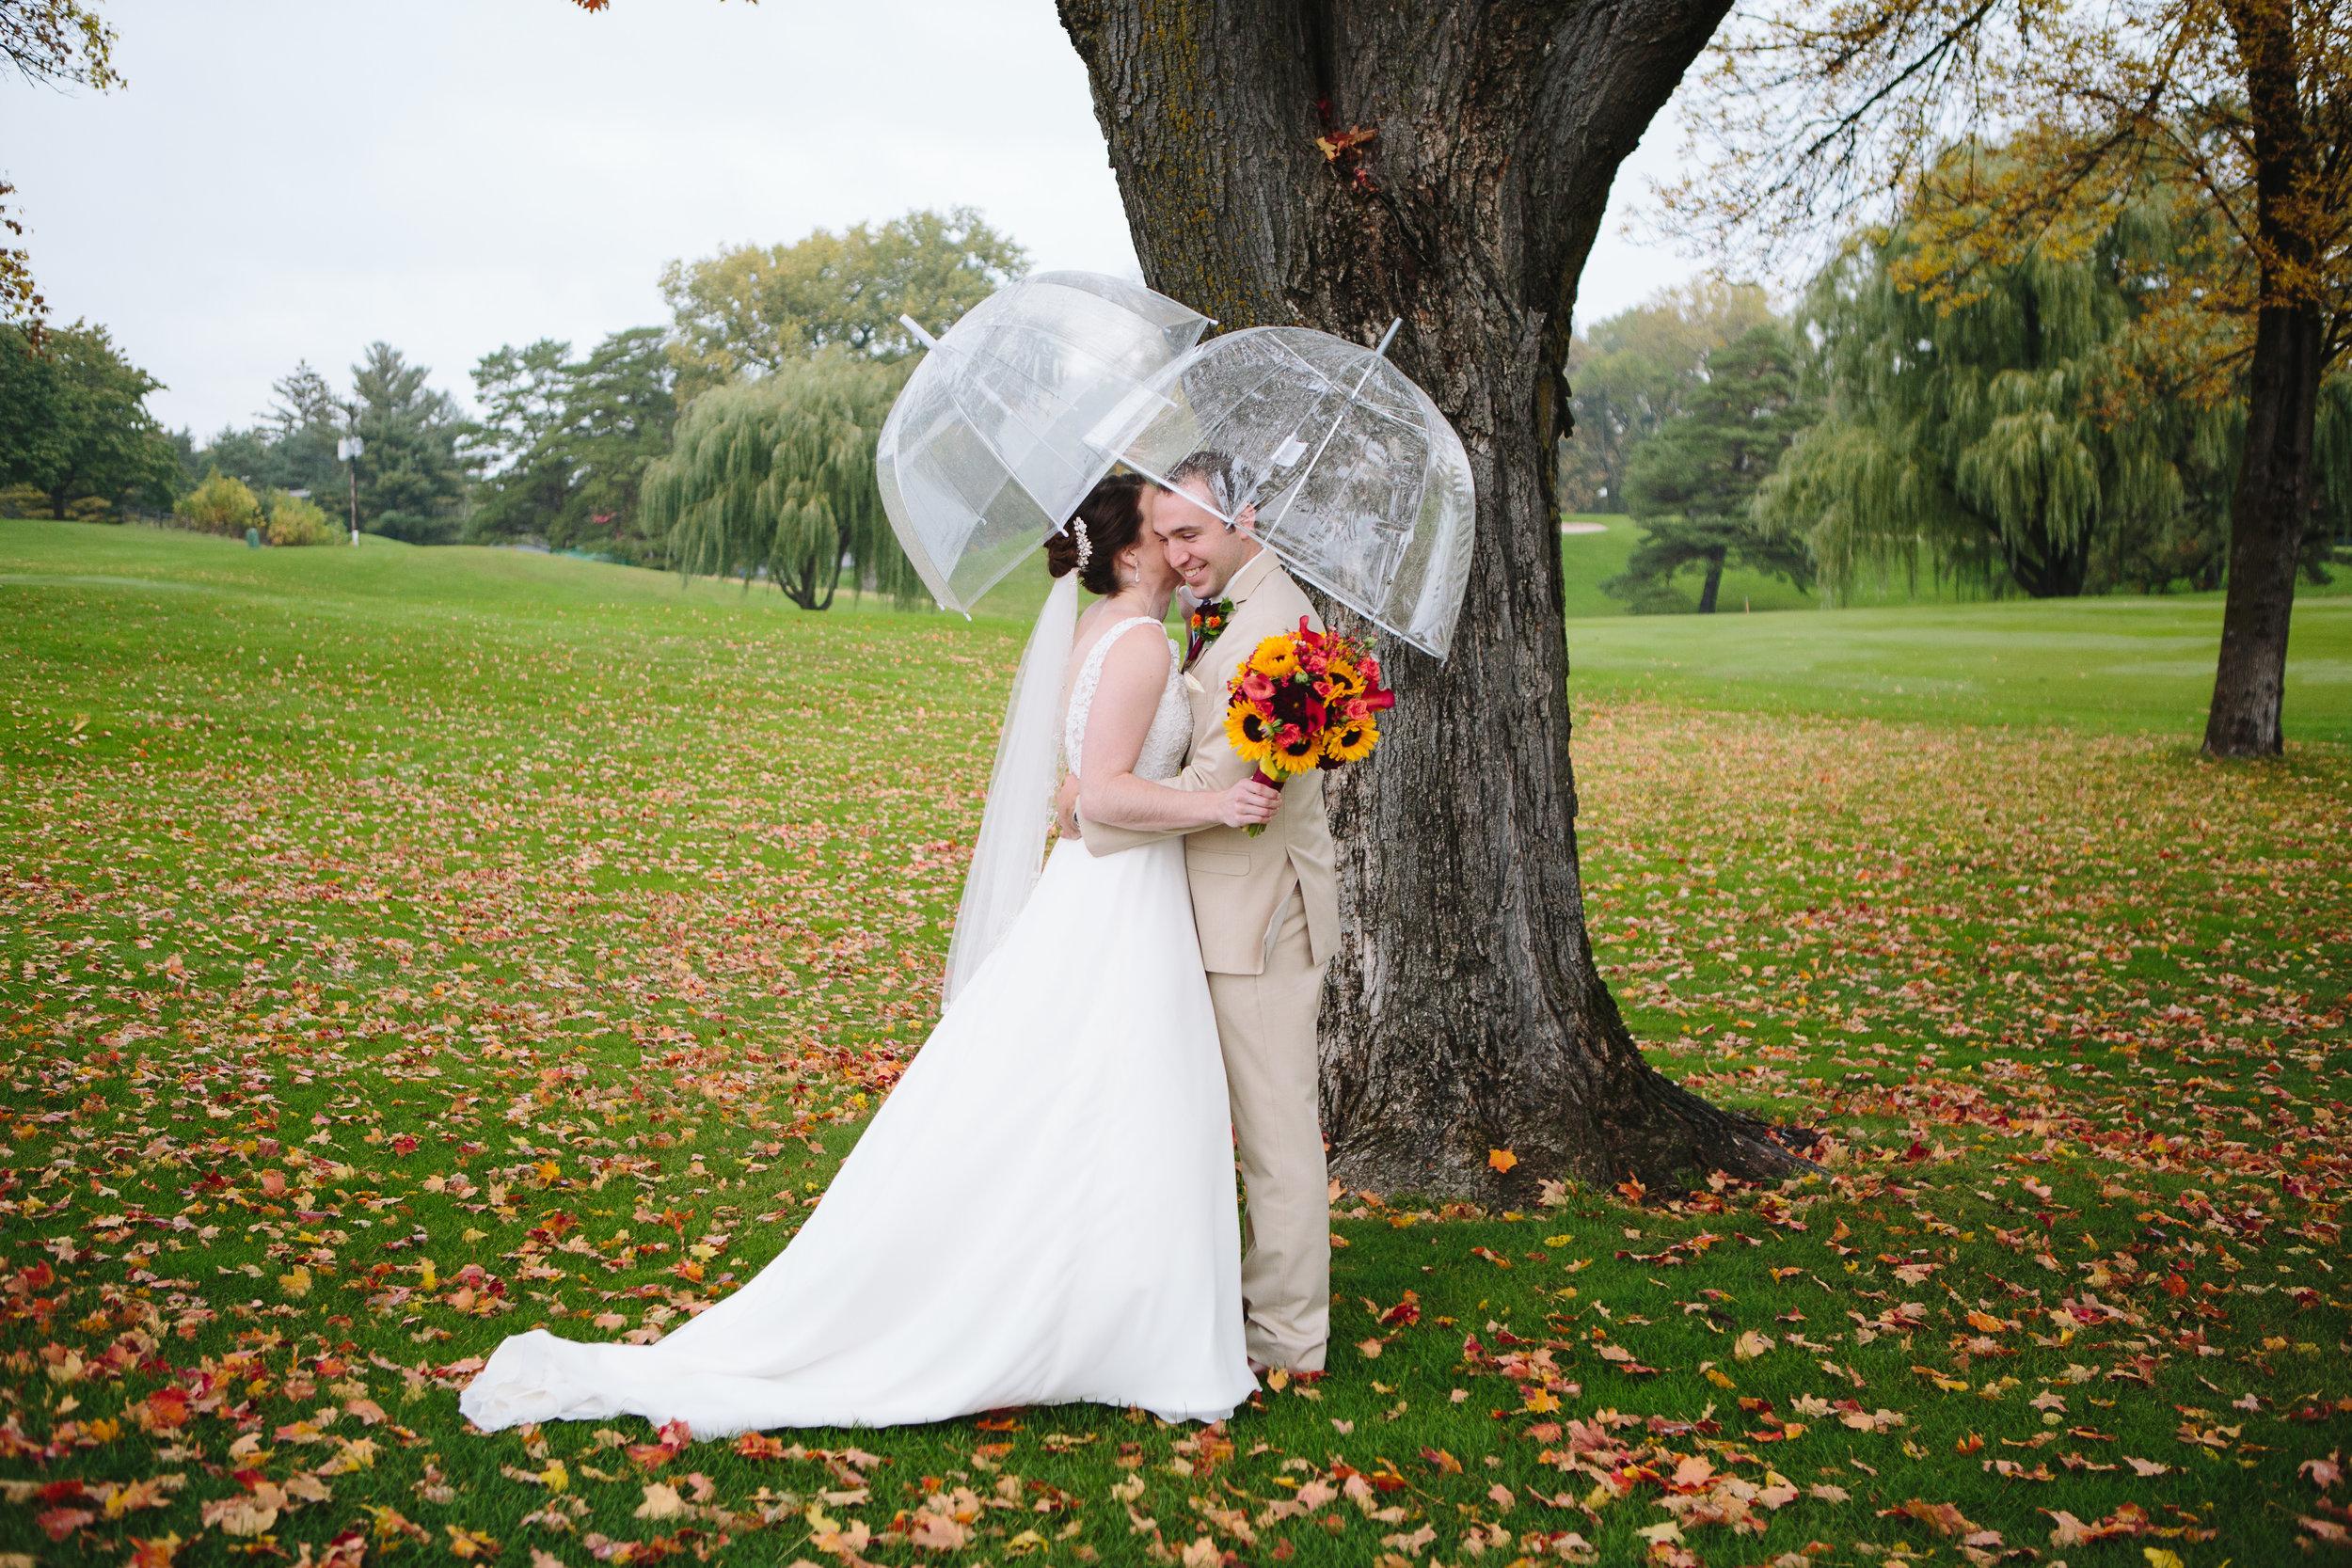 rainy wedding day, fall wedding, October wedding photography, prepare for rain on your wedding day, umbrella wedding photos, golf course wedding photos, candid romantic wedding photos